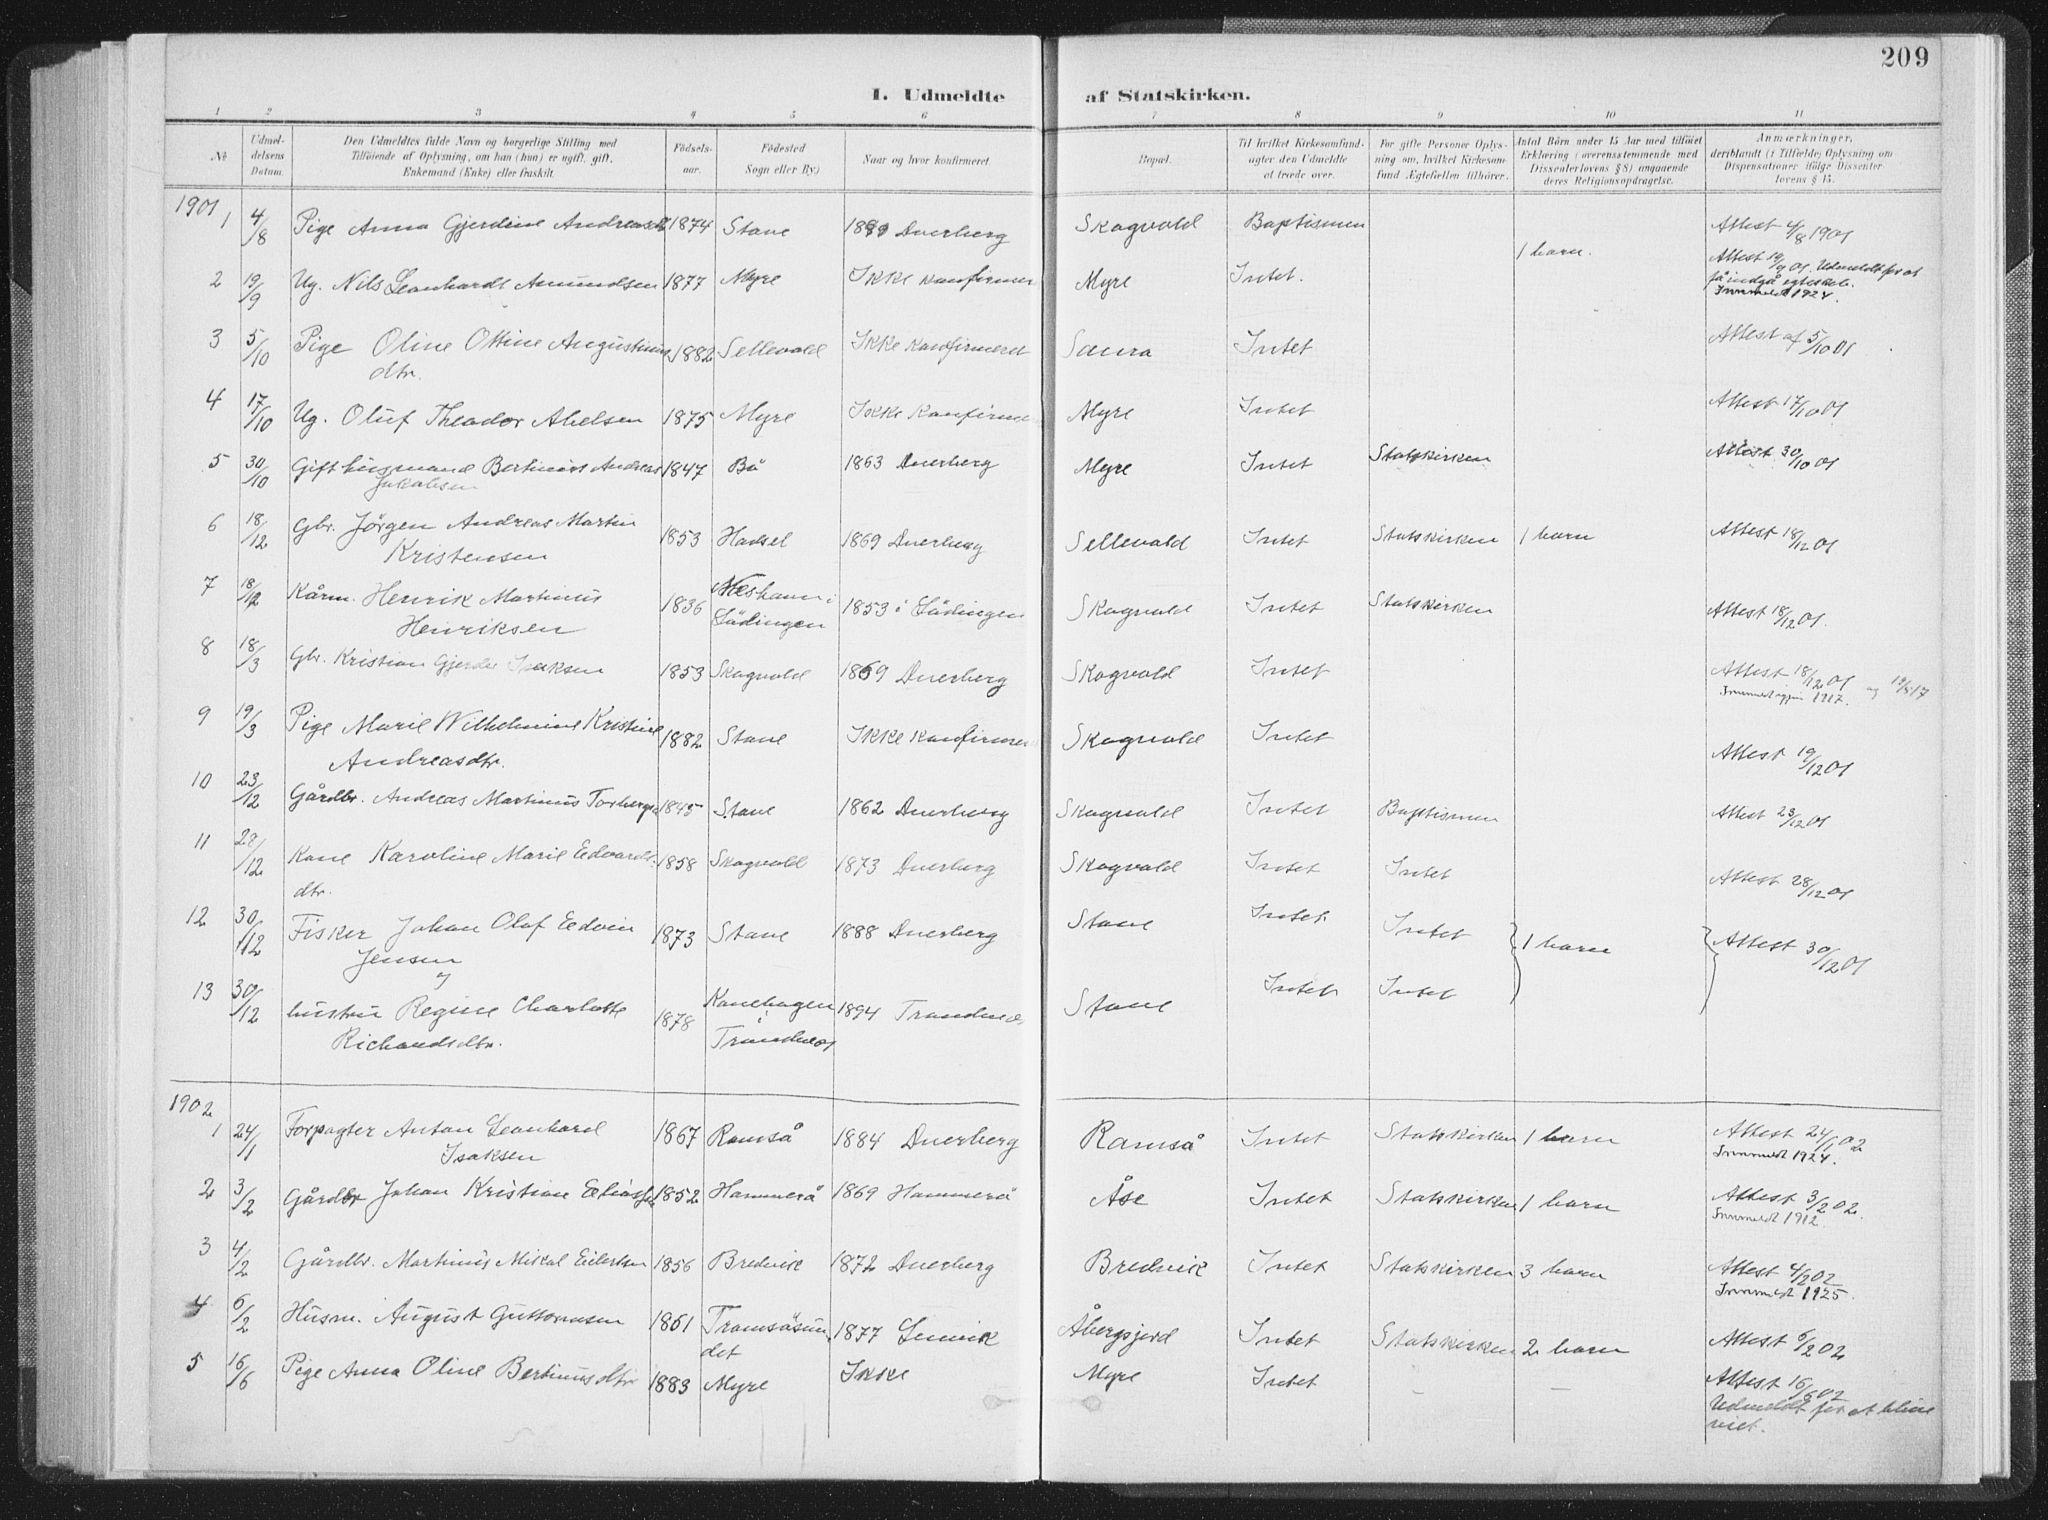 SAT, Ministerialprotokoller, klokkerbøker og fødselsregistre - Nordland, 897/L1400: Ministerialbok nr. 897A07, 1897-1908, s. 209